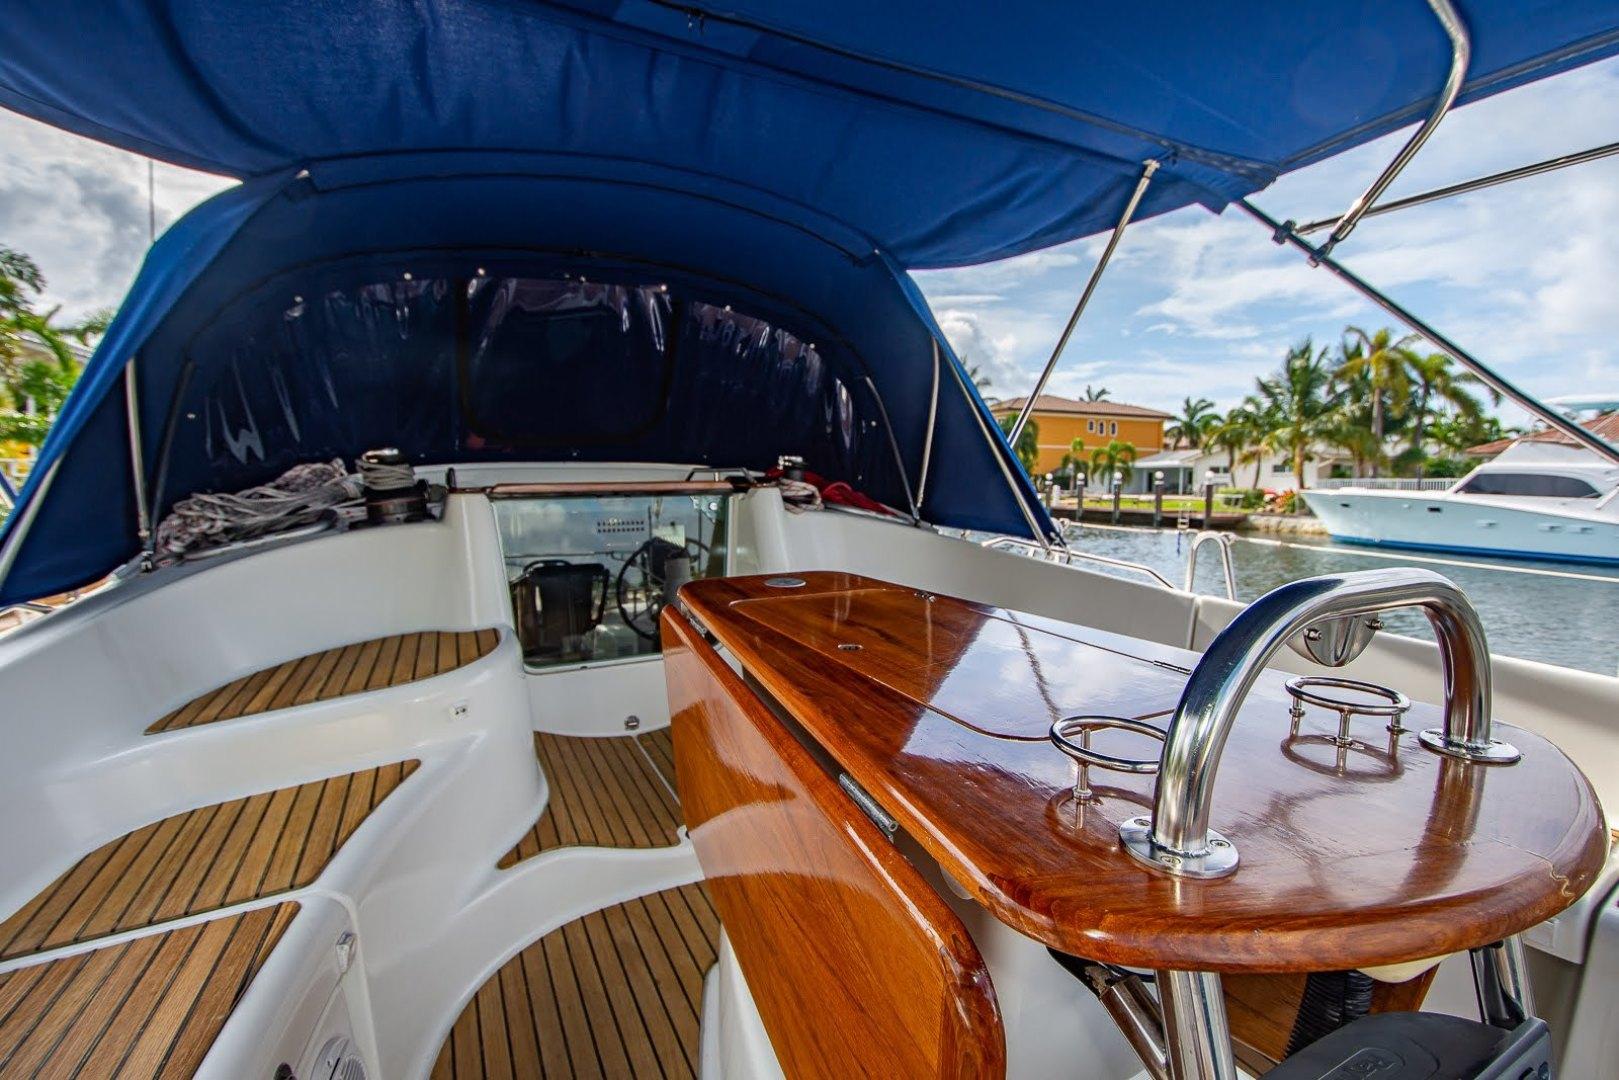 Jeanneau-42DS 2007-Layla Fort Lauderdale-Florida-United States-Jeanneau 42DS-1551257 | Thumbnail